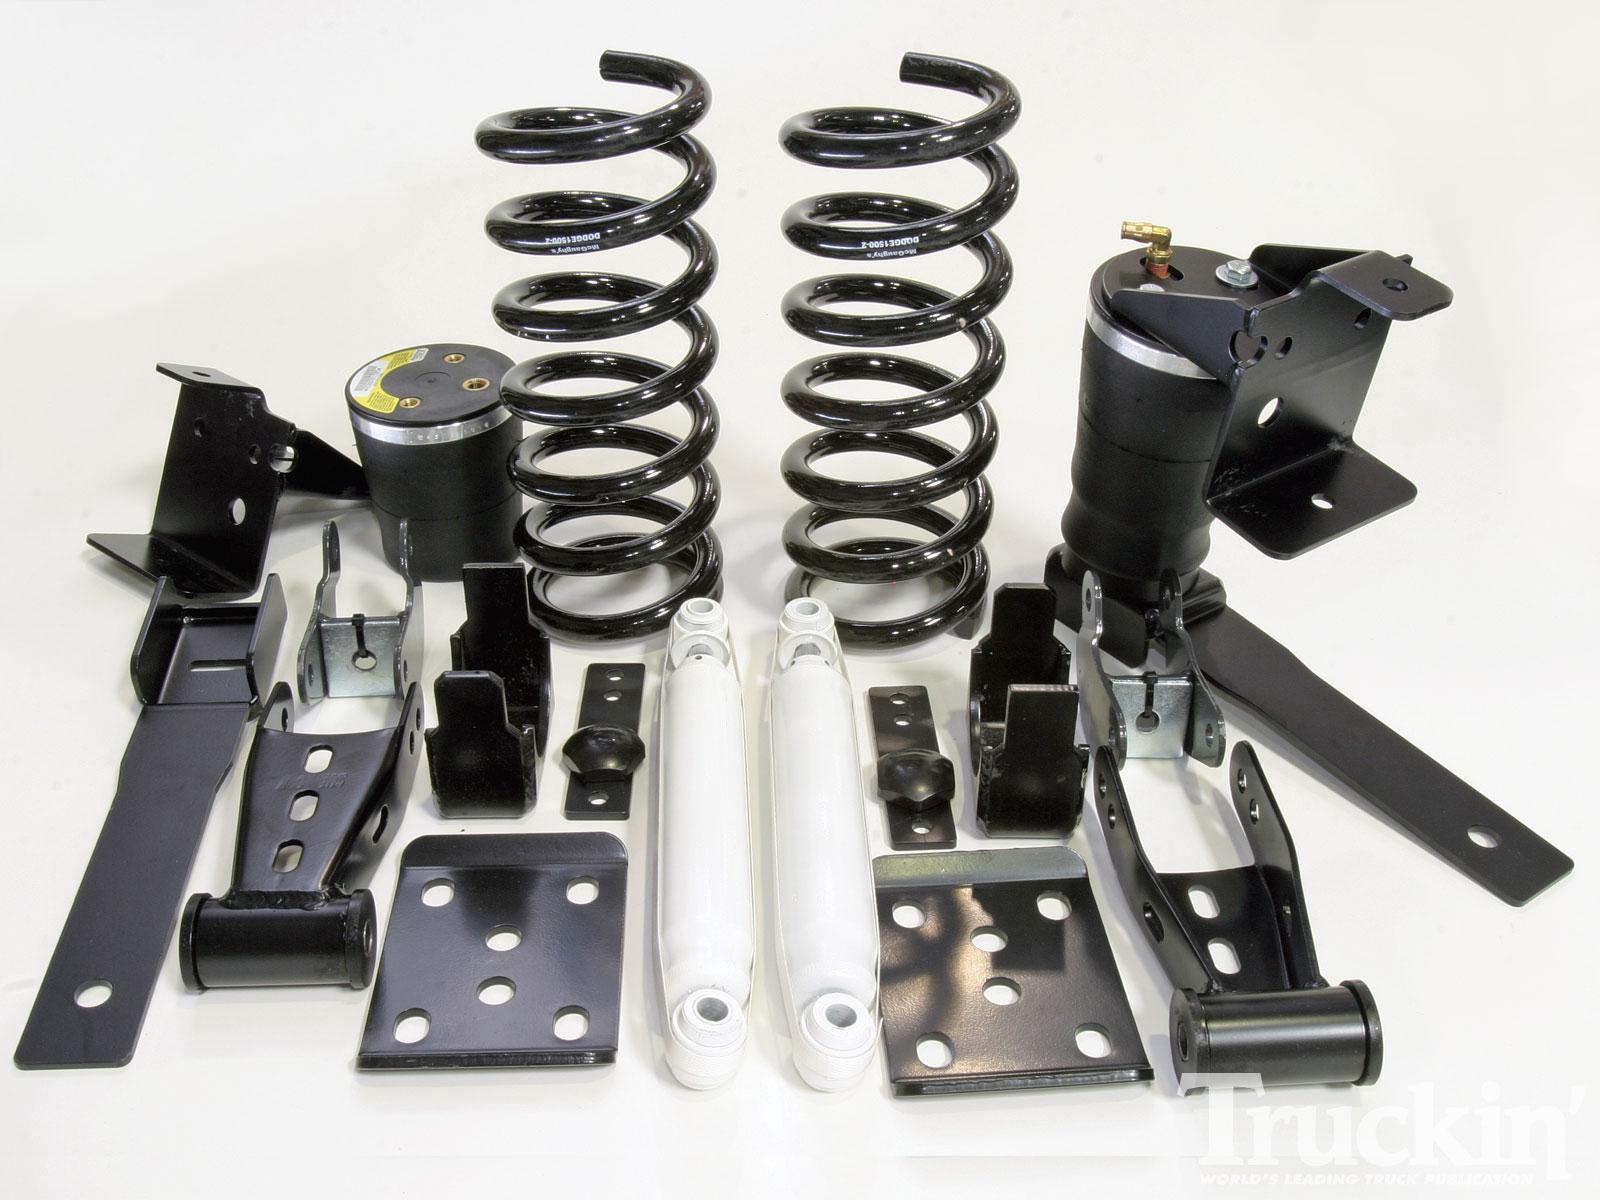 McGaughy's Dodge Ram SRT Lowering Kit - Tech Articles - Truckin